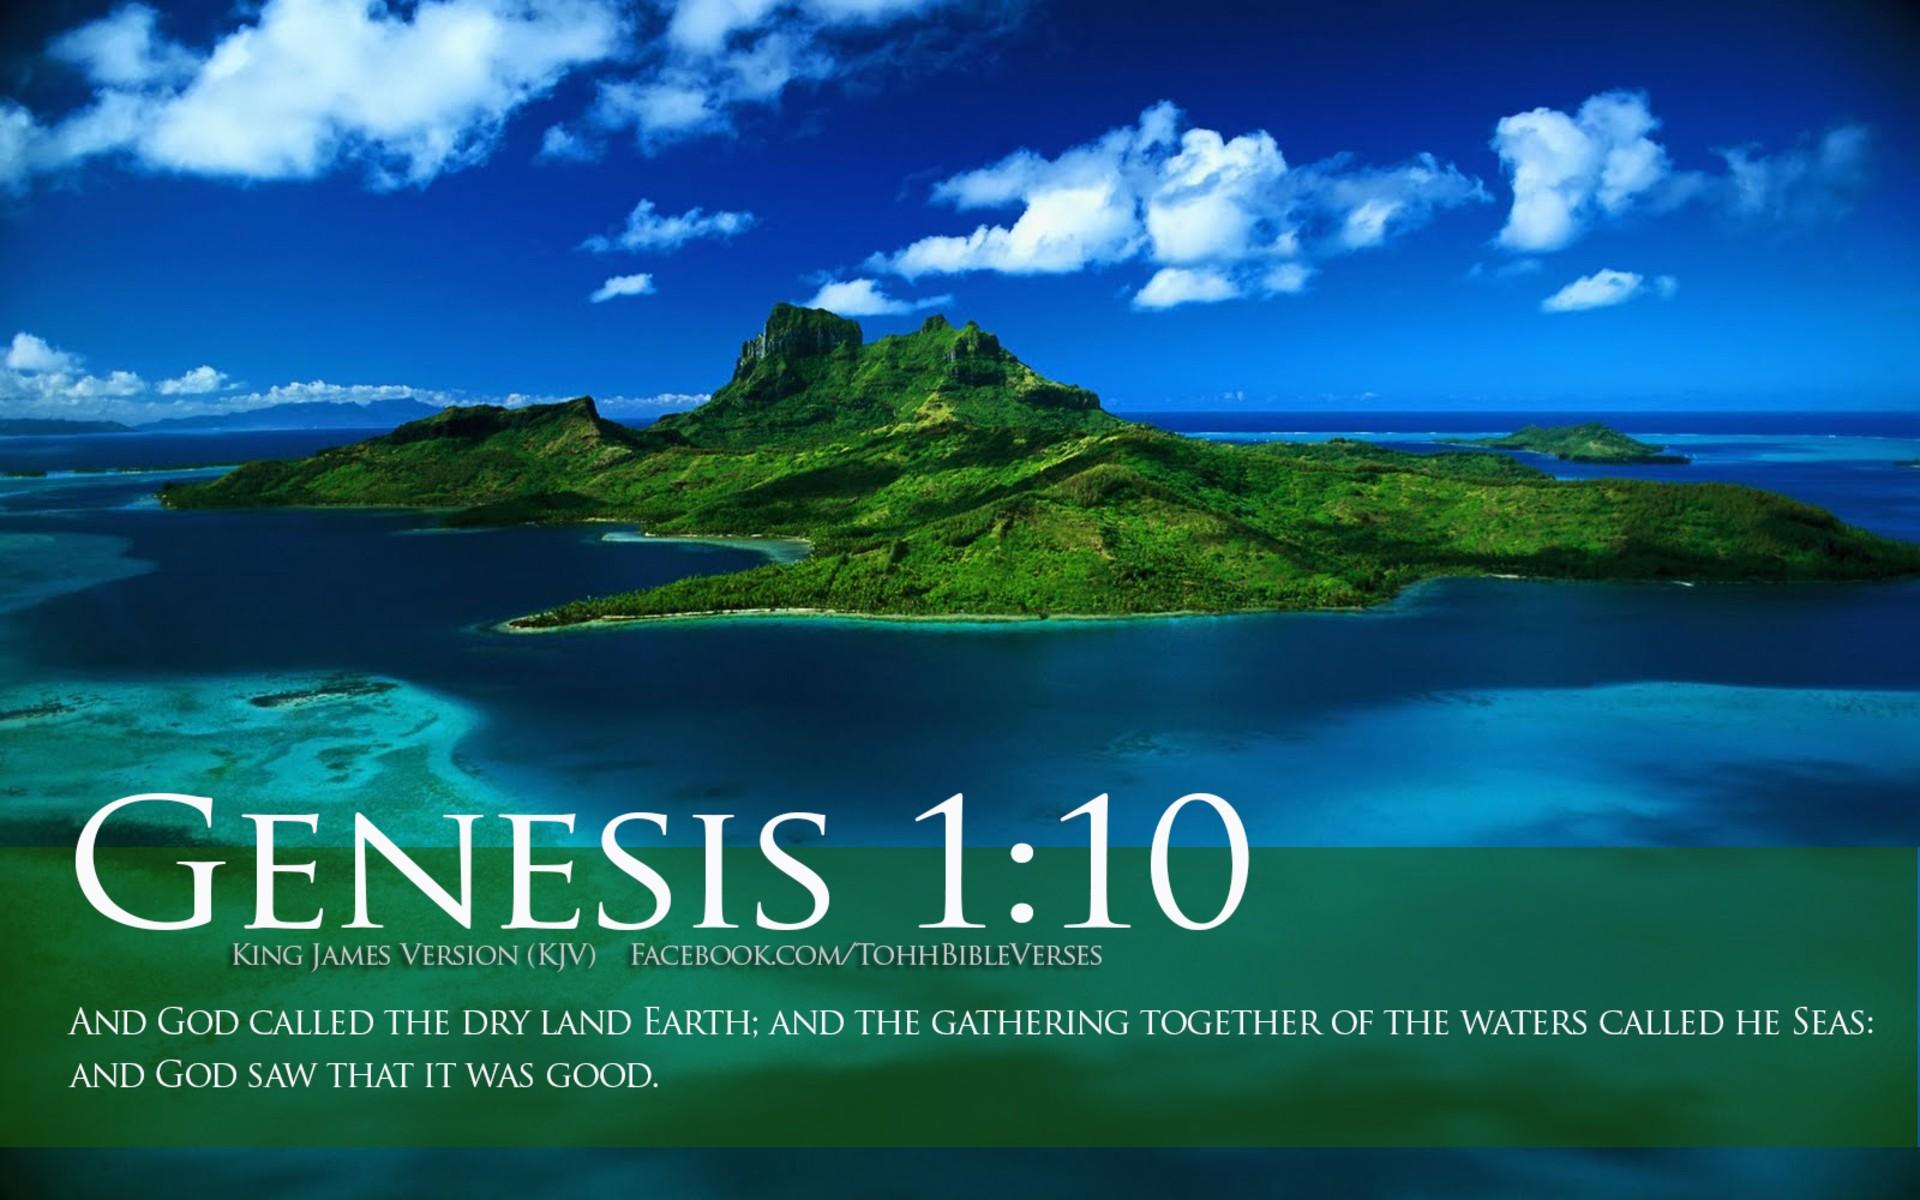 1920x1200 bible verses quote text poster bible verses js wallpaper background